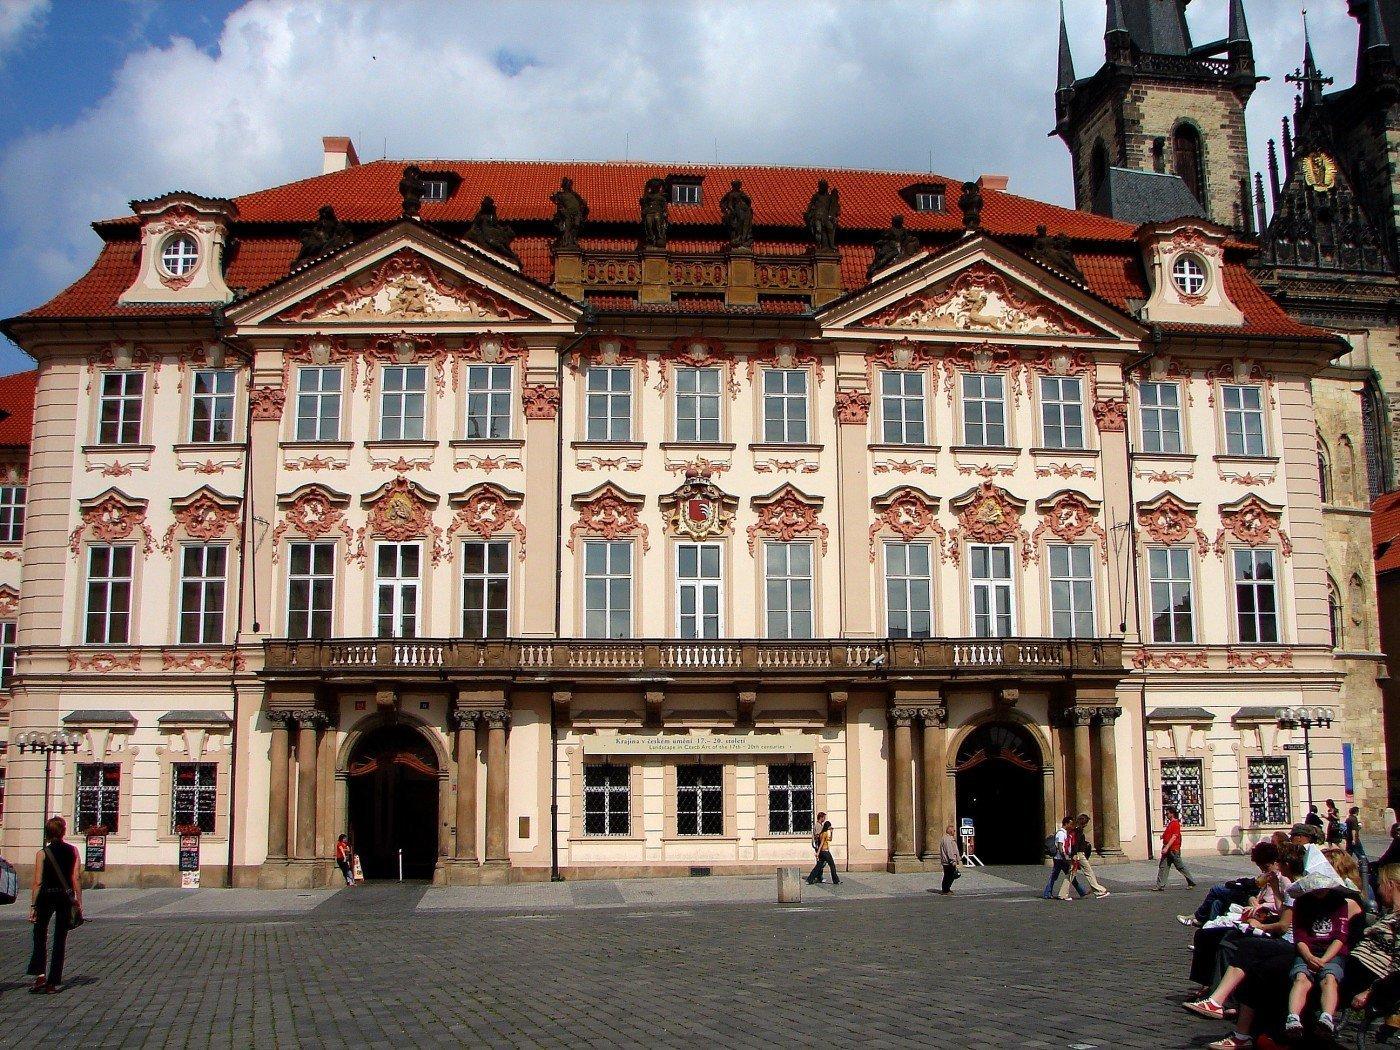 Palác Kinských - Golz-Kinských (Kinský Palace) that houses the National Gallery exhibition hall. Photo by Tjflex2 via Flickr CC